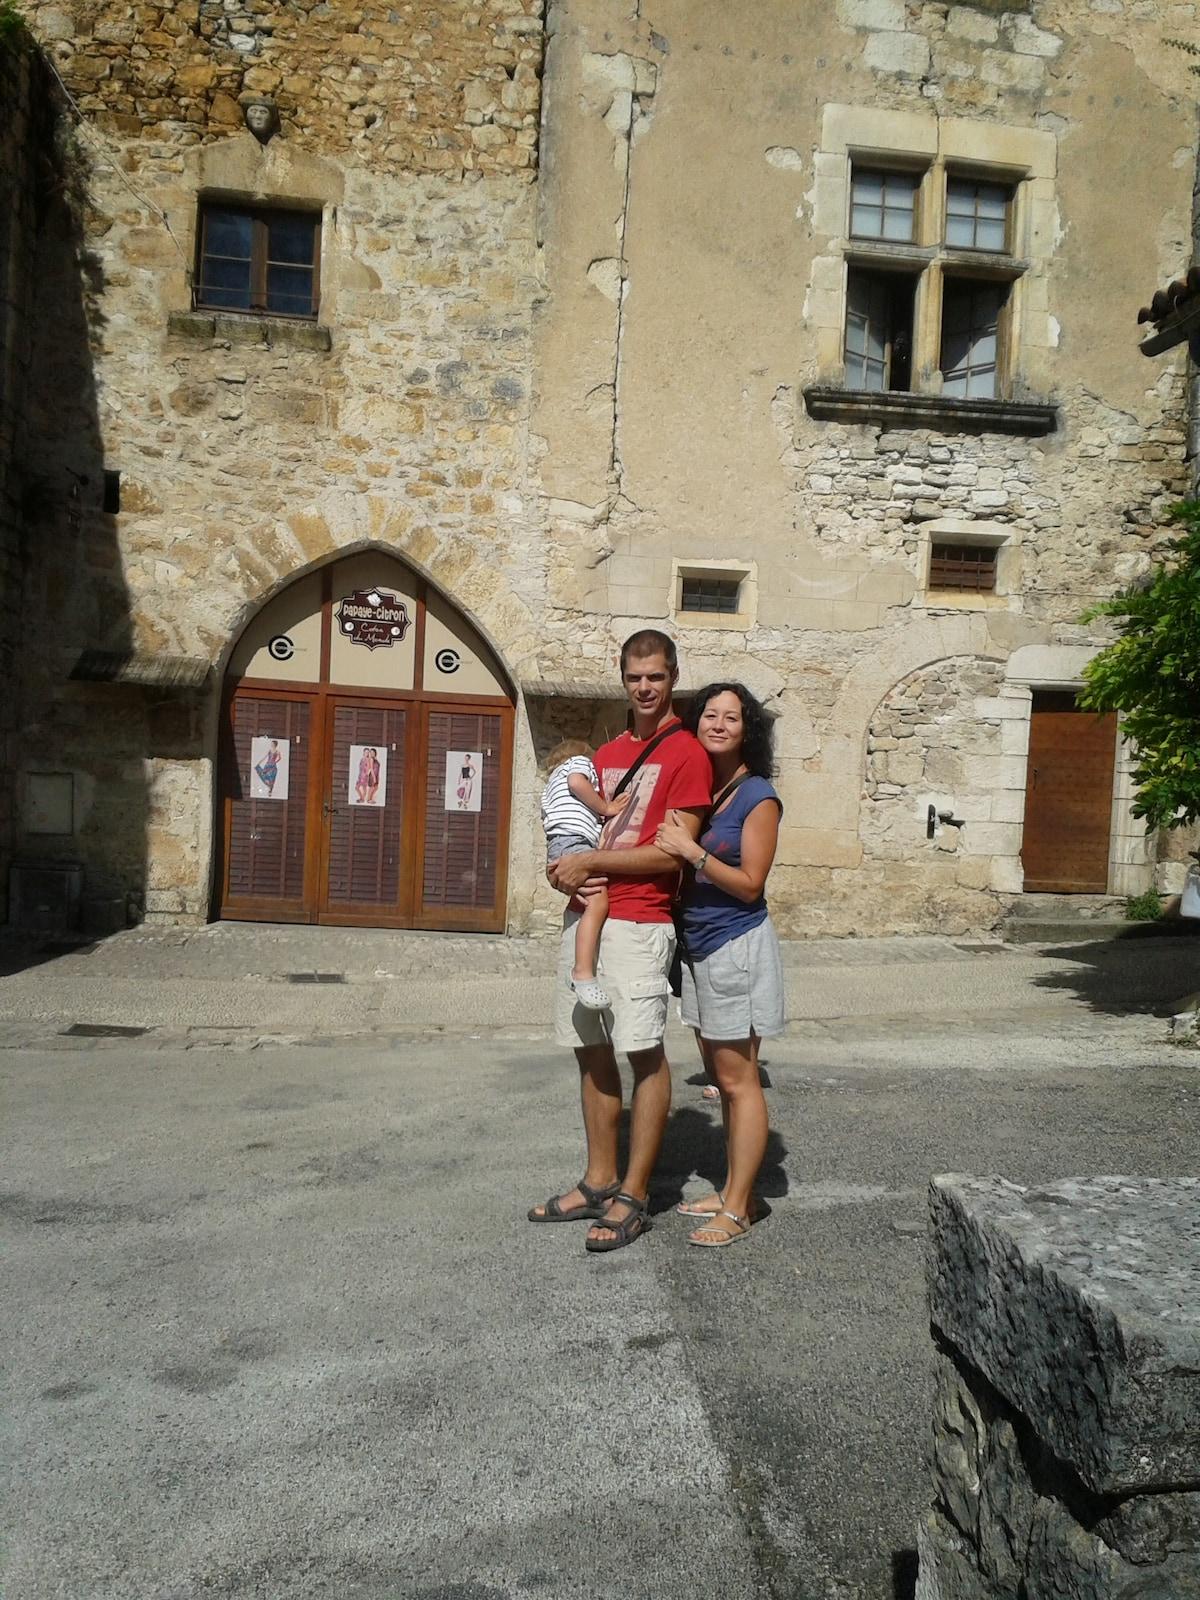 Monika Et Nicolas from Arles